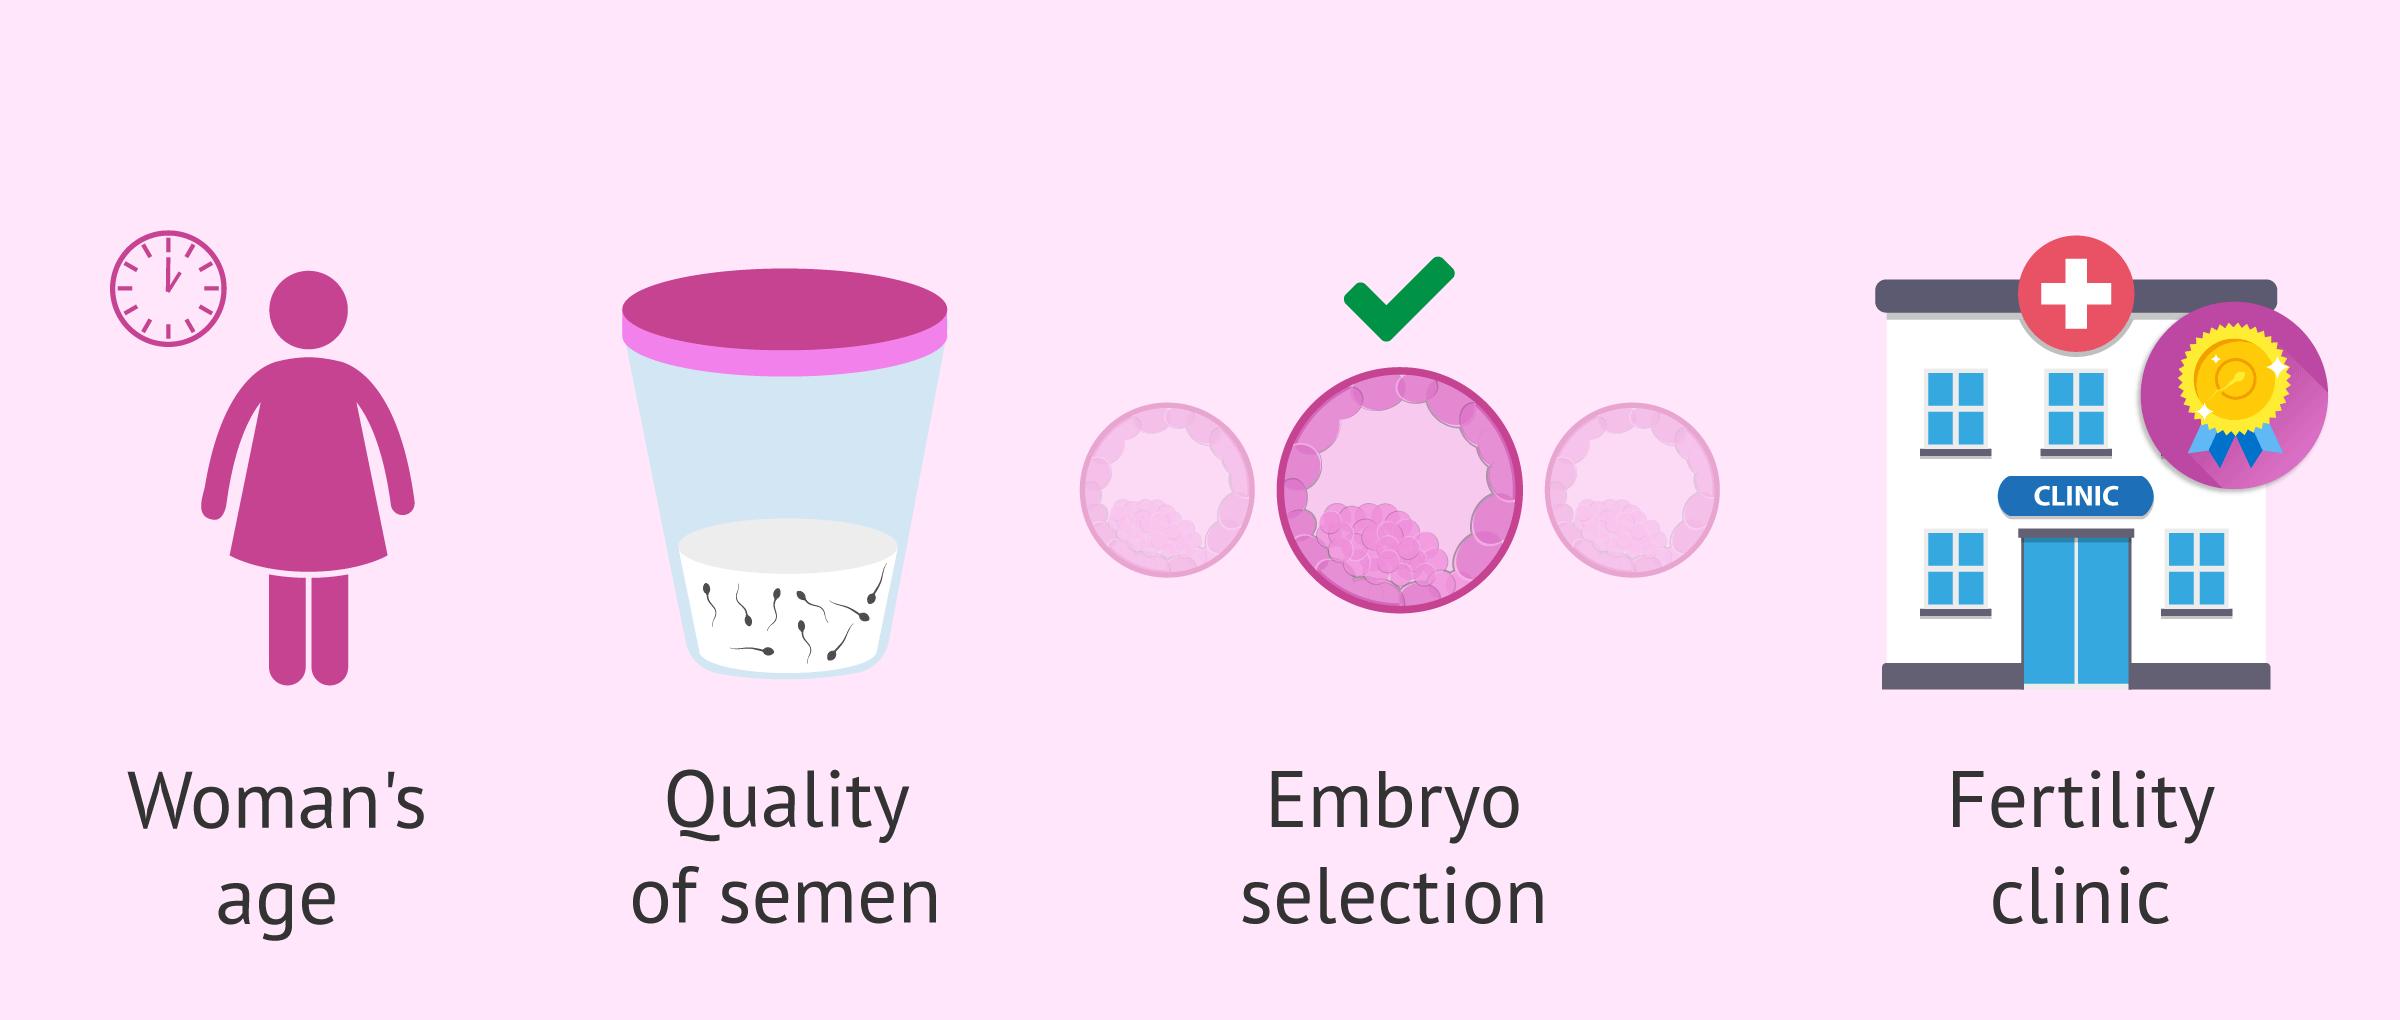 What factors predict the success of IVF?